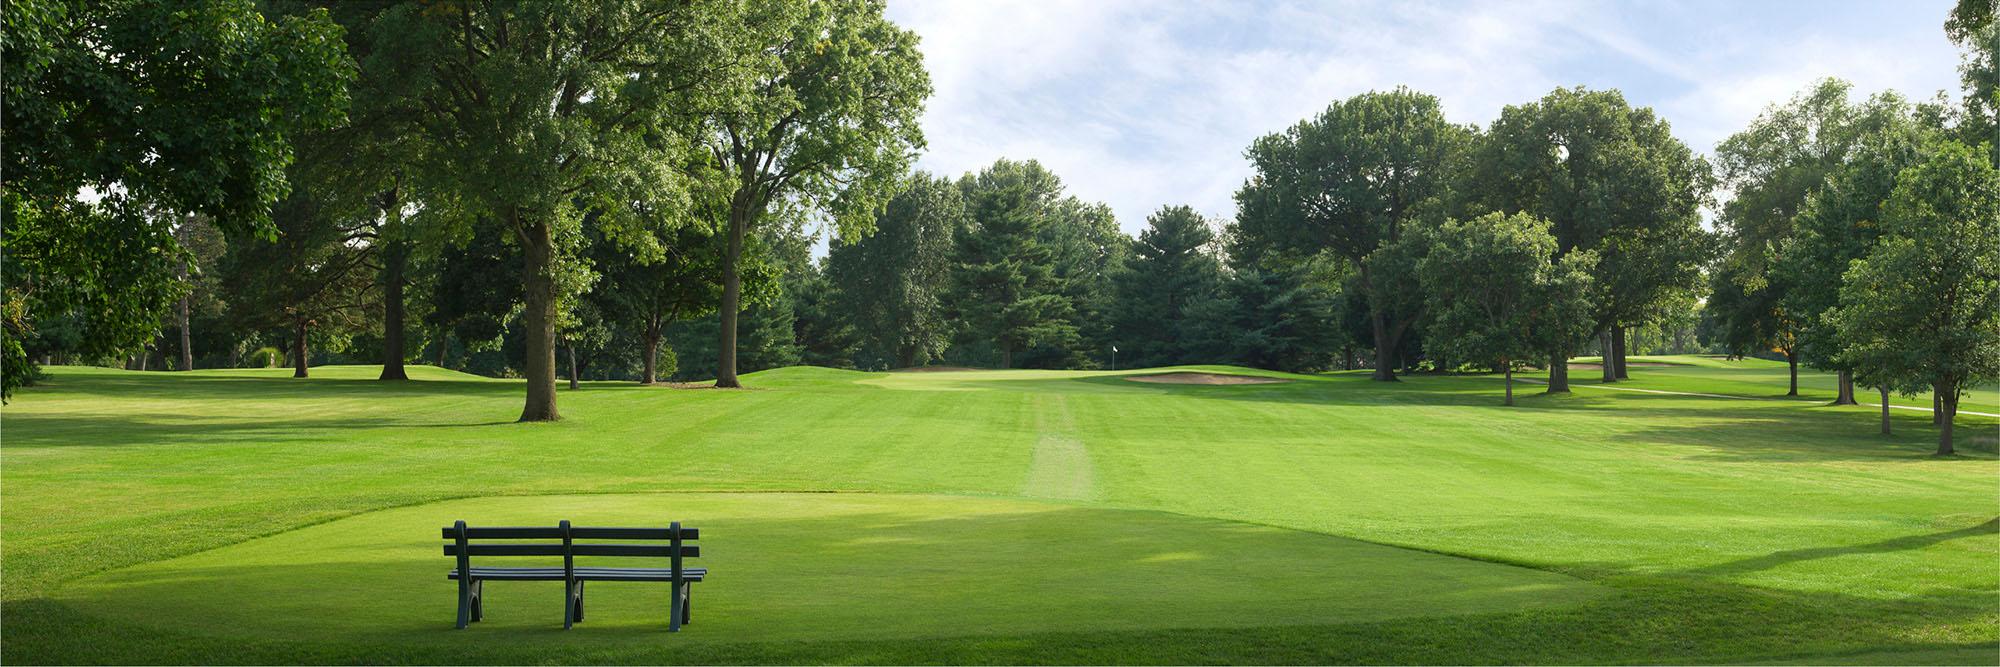 Golf Course Image - Milburn No. 7